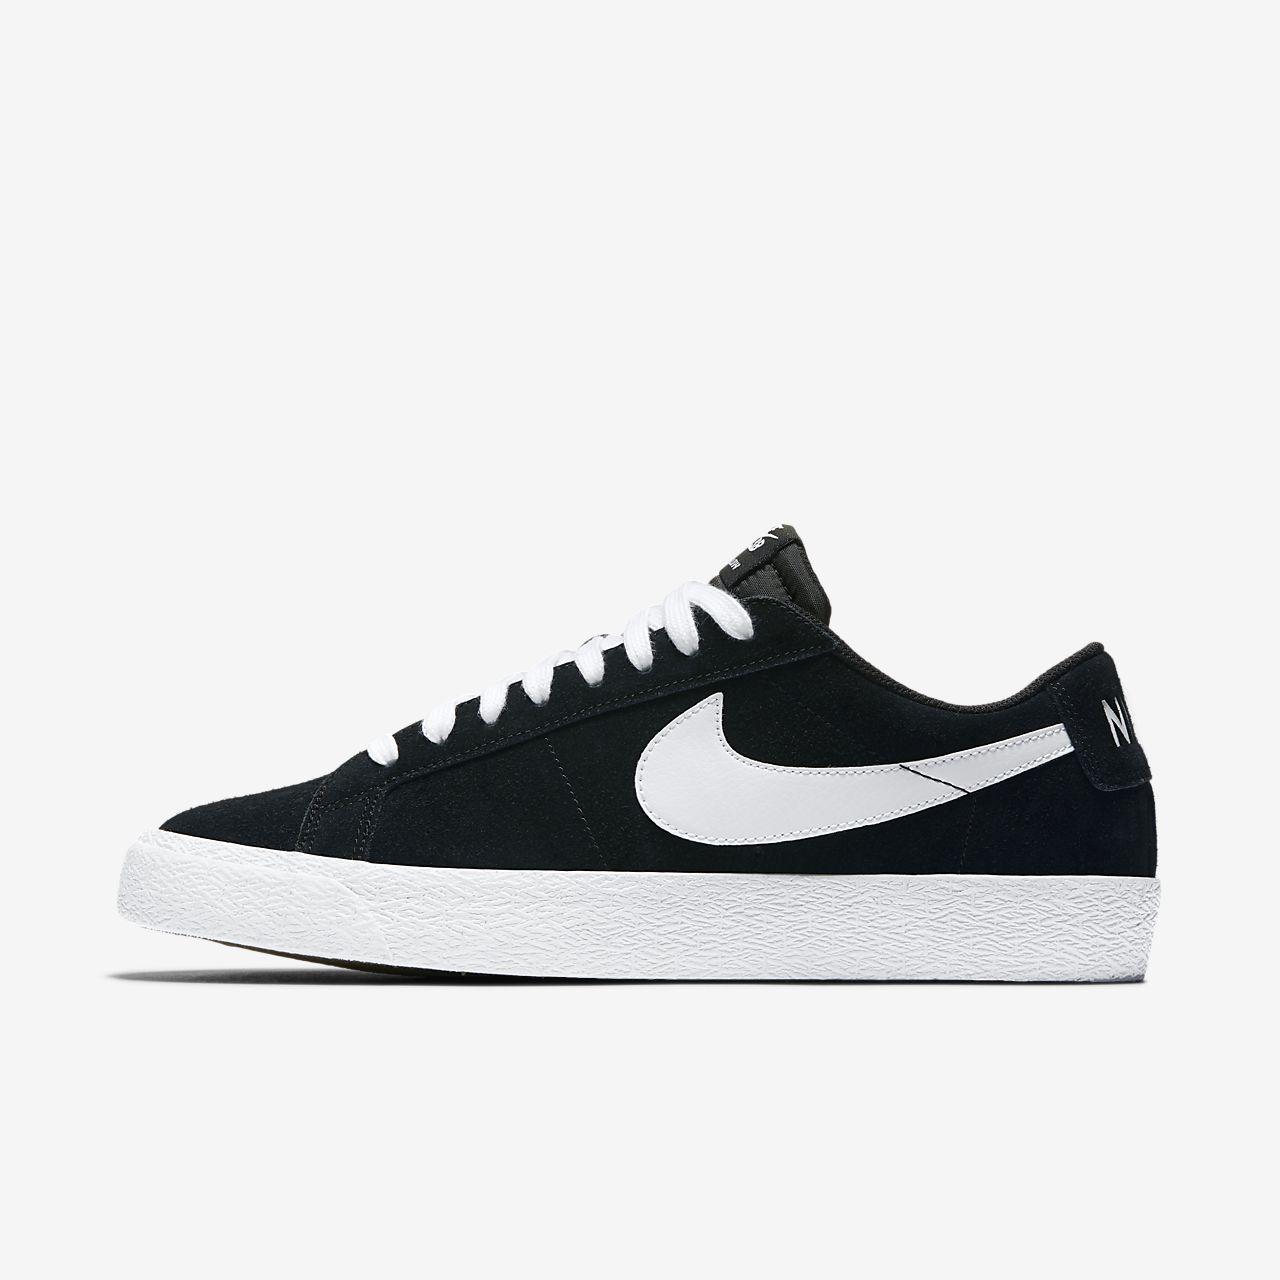 size 40 e9a2a 6e674 ... Chaussure de skateboard Nike SB Blazer Zoom Low pour Homme